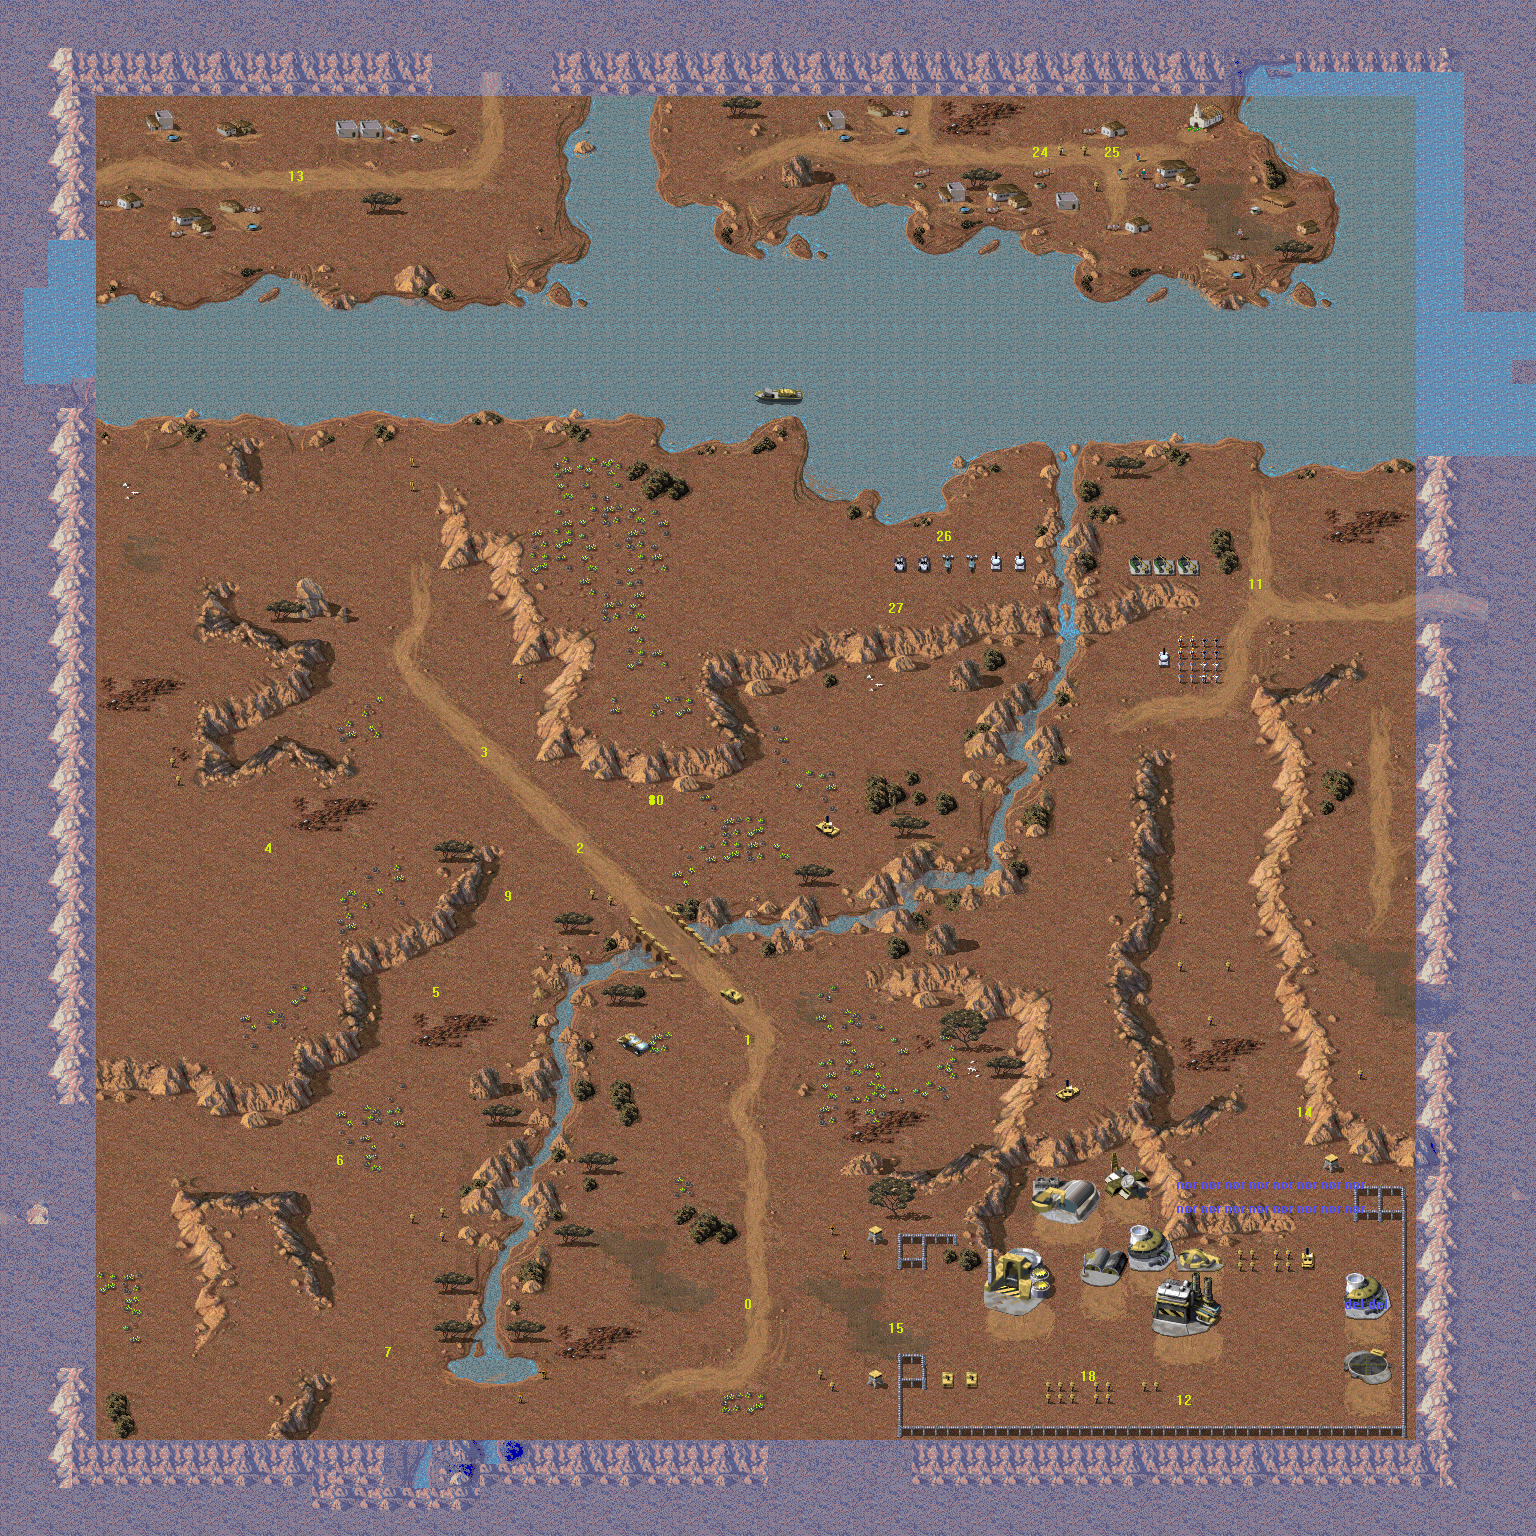 C&C TD - Map Remakes CHOOSE! - GameReplays org